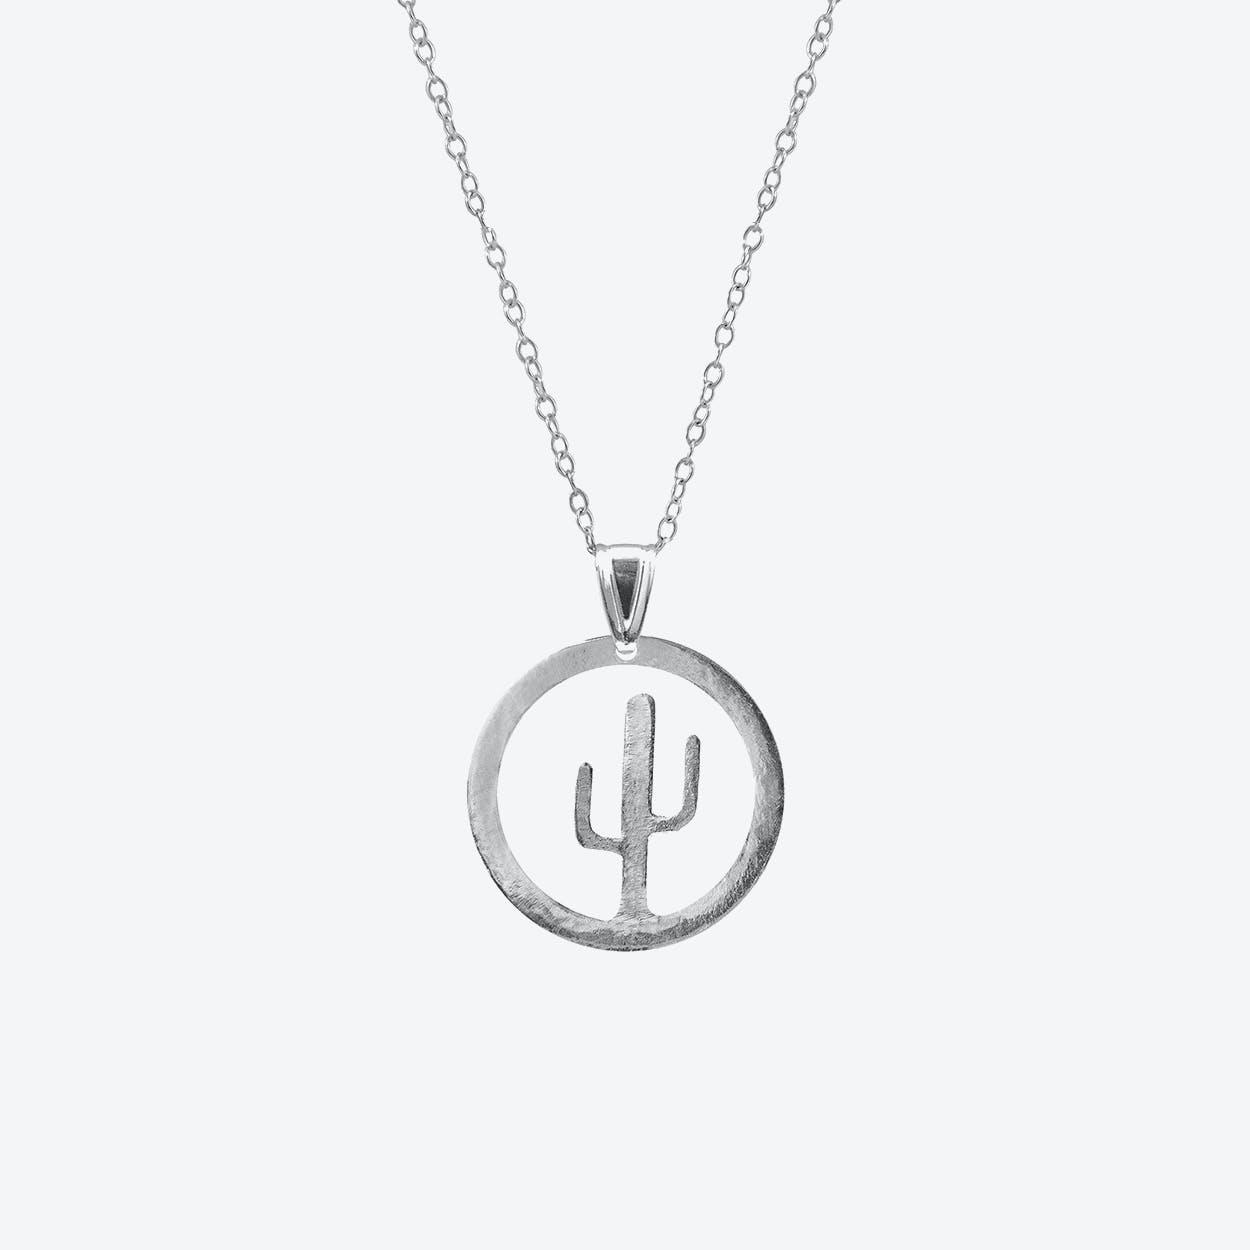 Cactus Tree Disc Paradise Silver Necklace Pendant